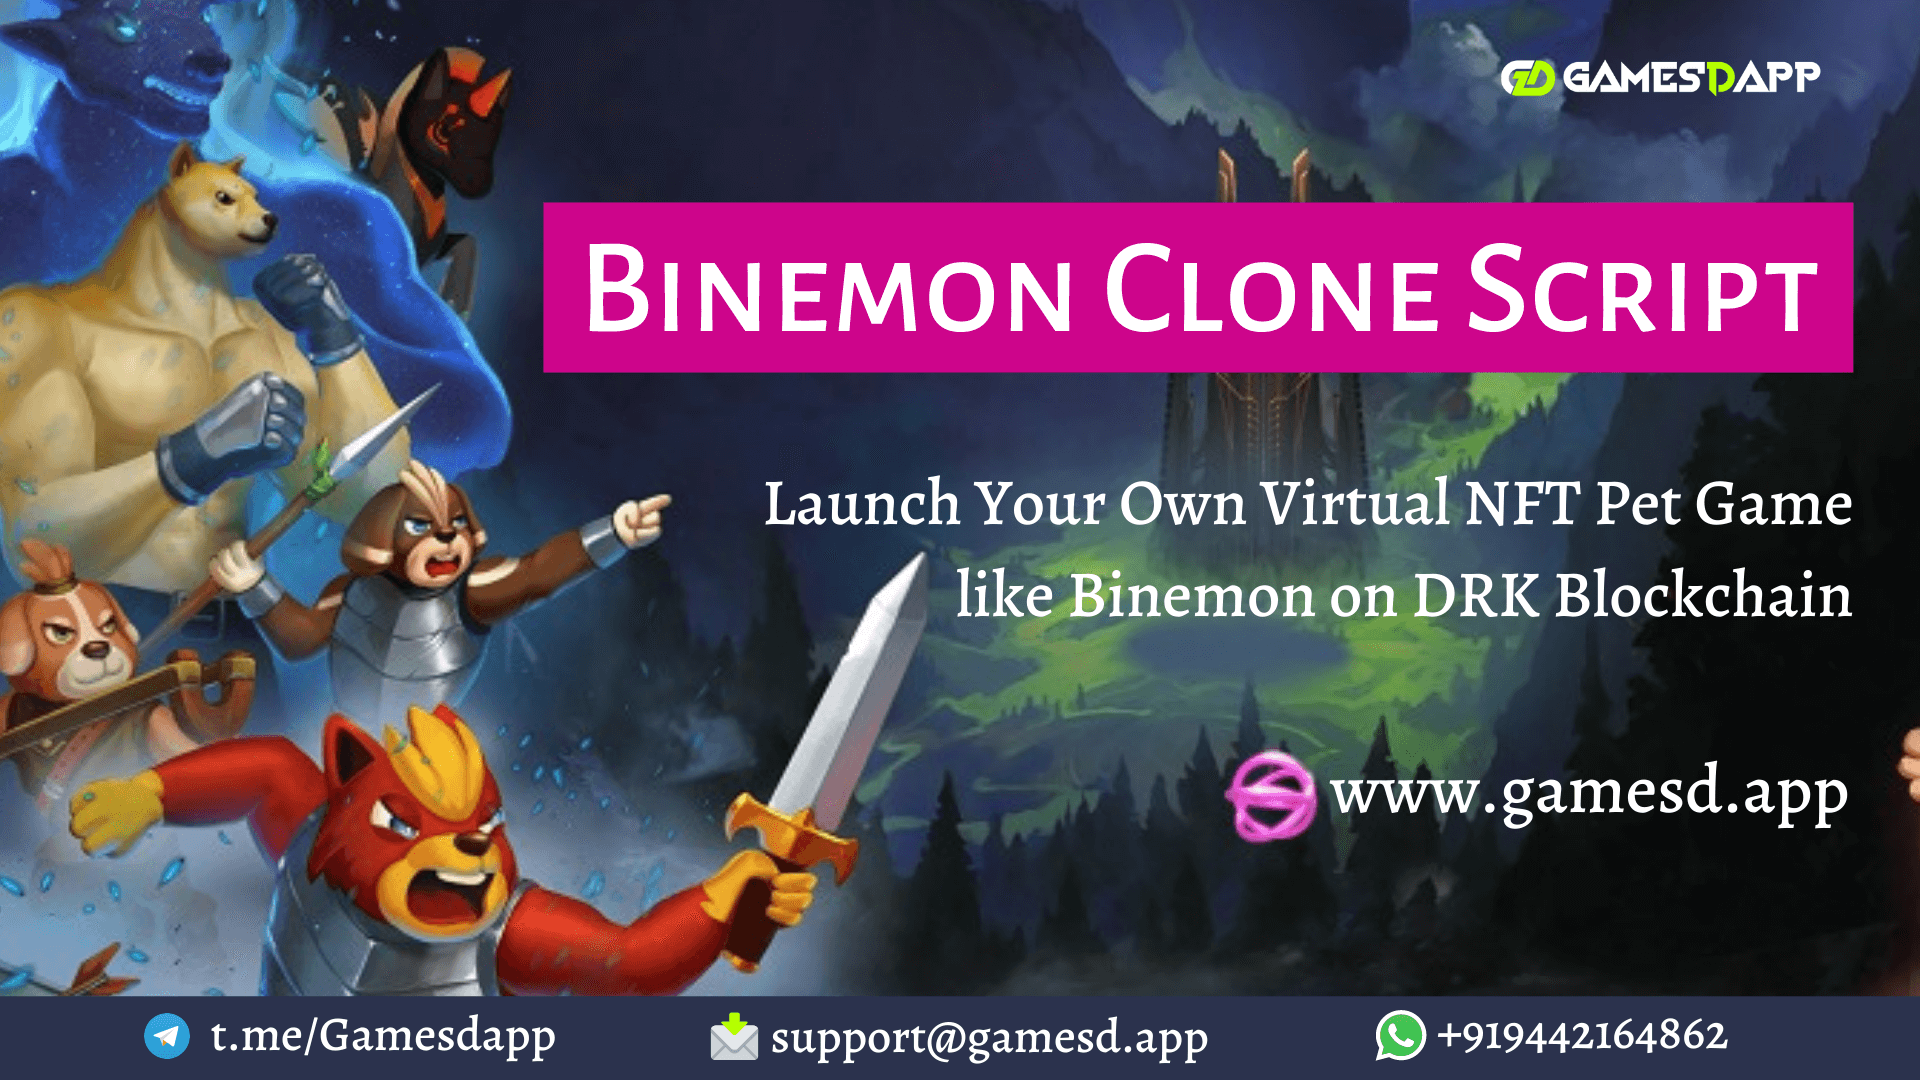 Binemon Clone Script - To Develop NFT based Play-to-earn Game like Binemon on DRK Blockchain